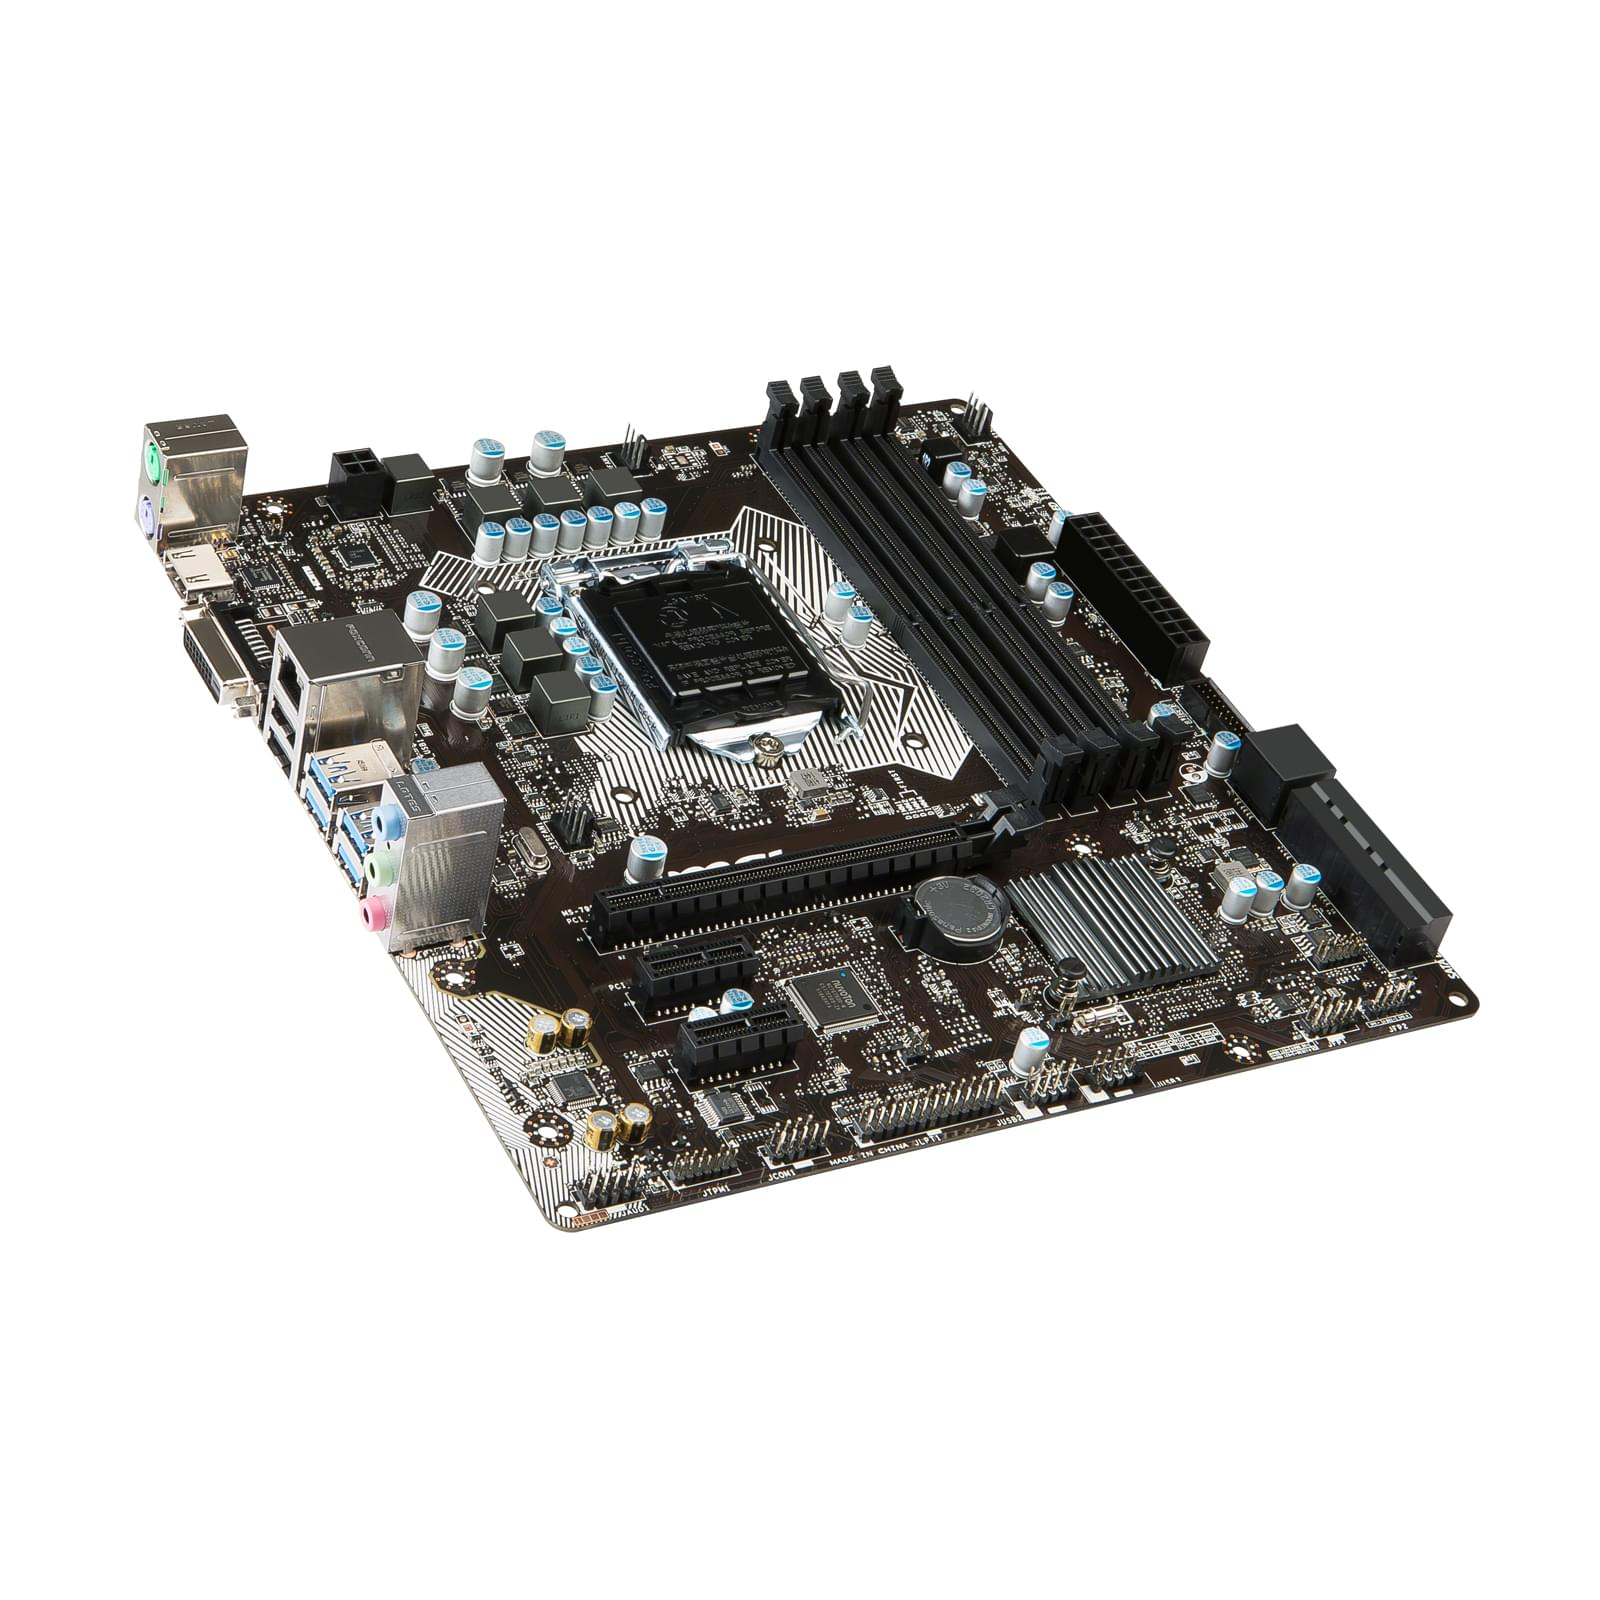 MSI B150M PRO-DH (B150M PRO-DH) - Achat / Vente Carte Mère sur Cybertek.fr - 0